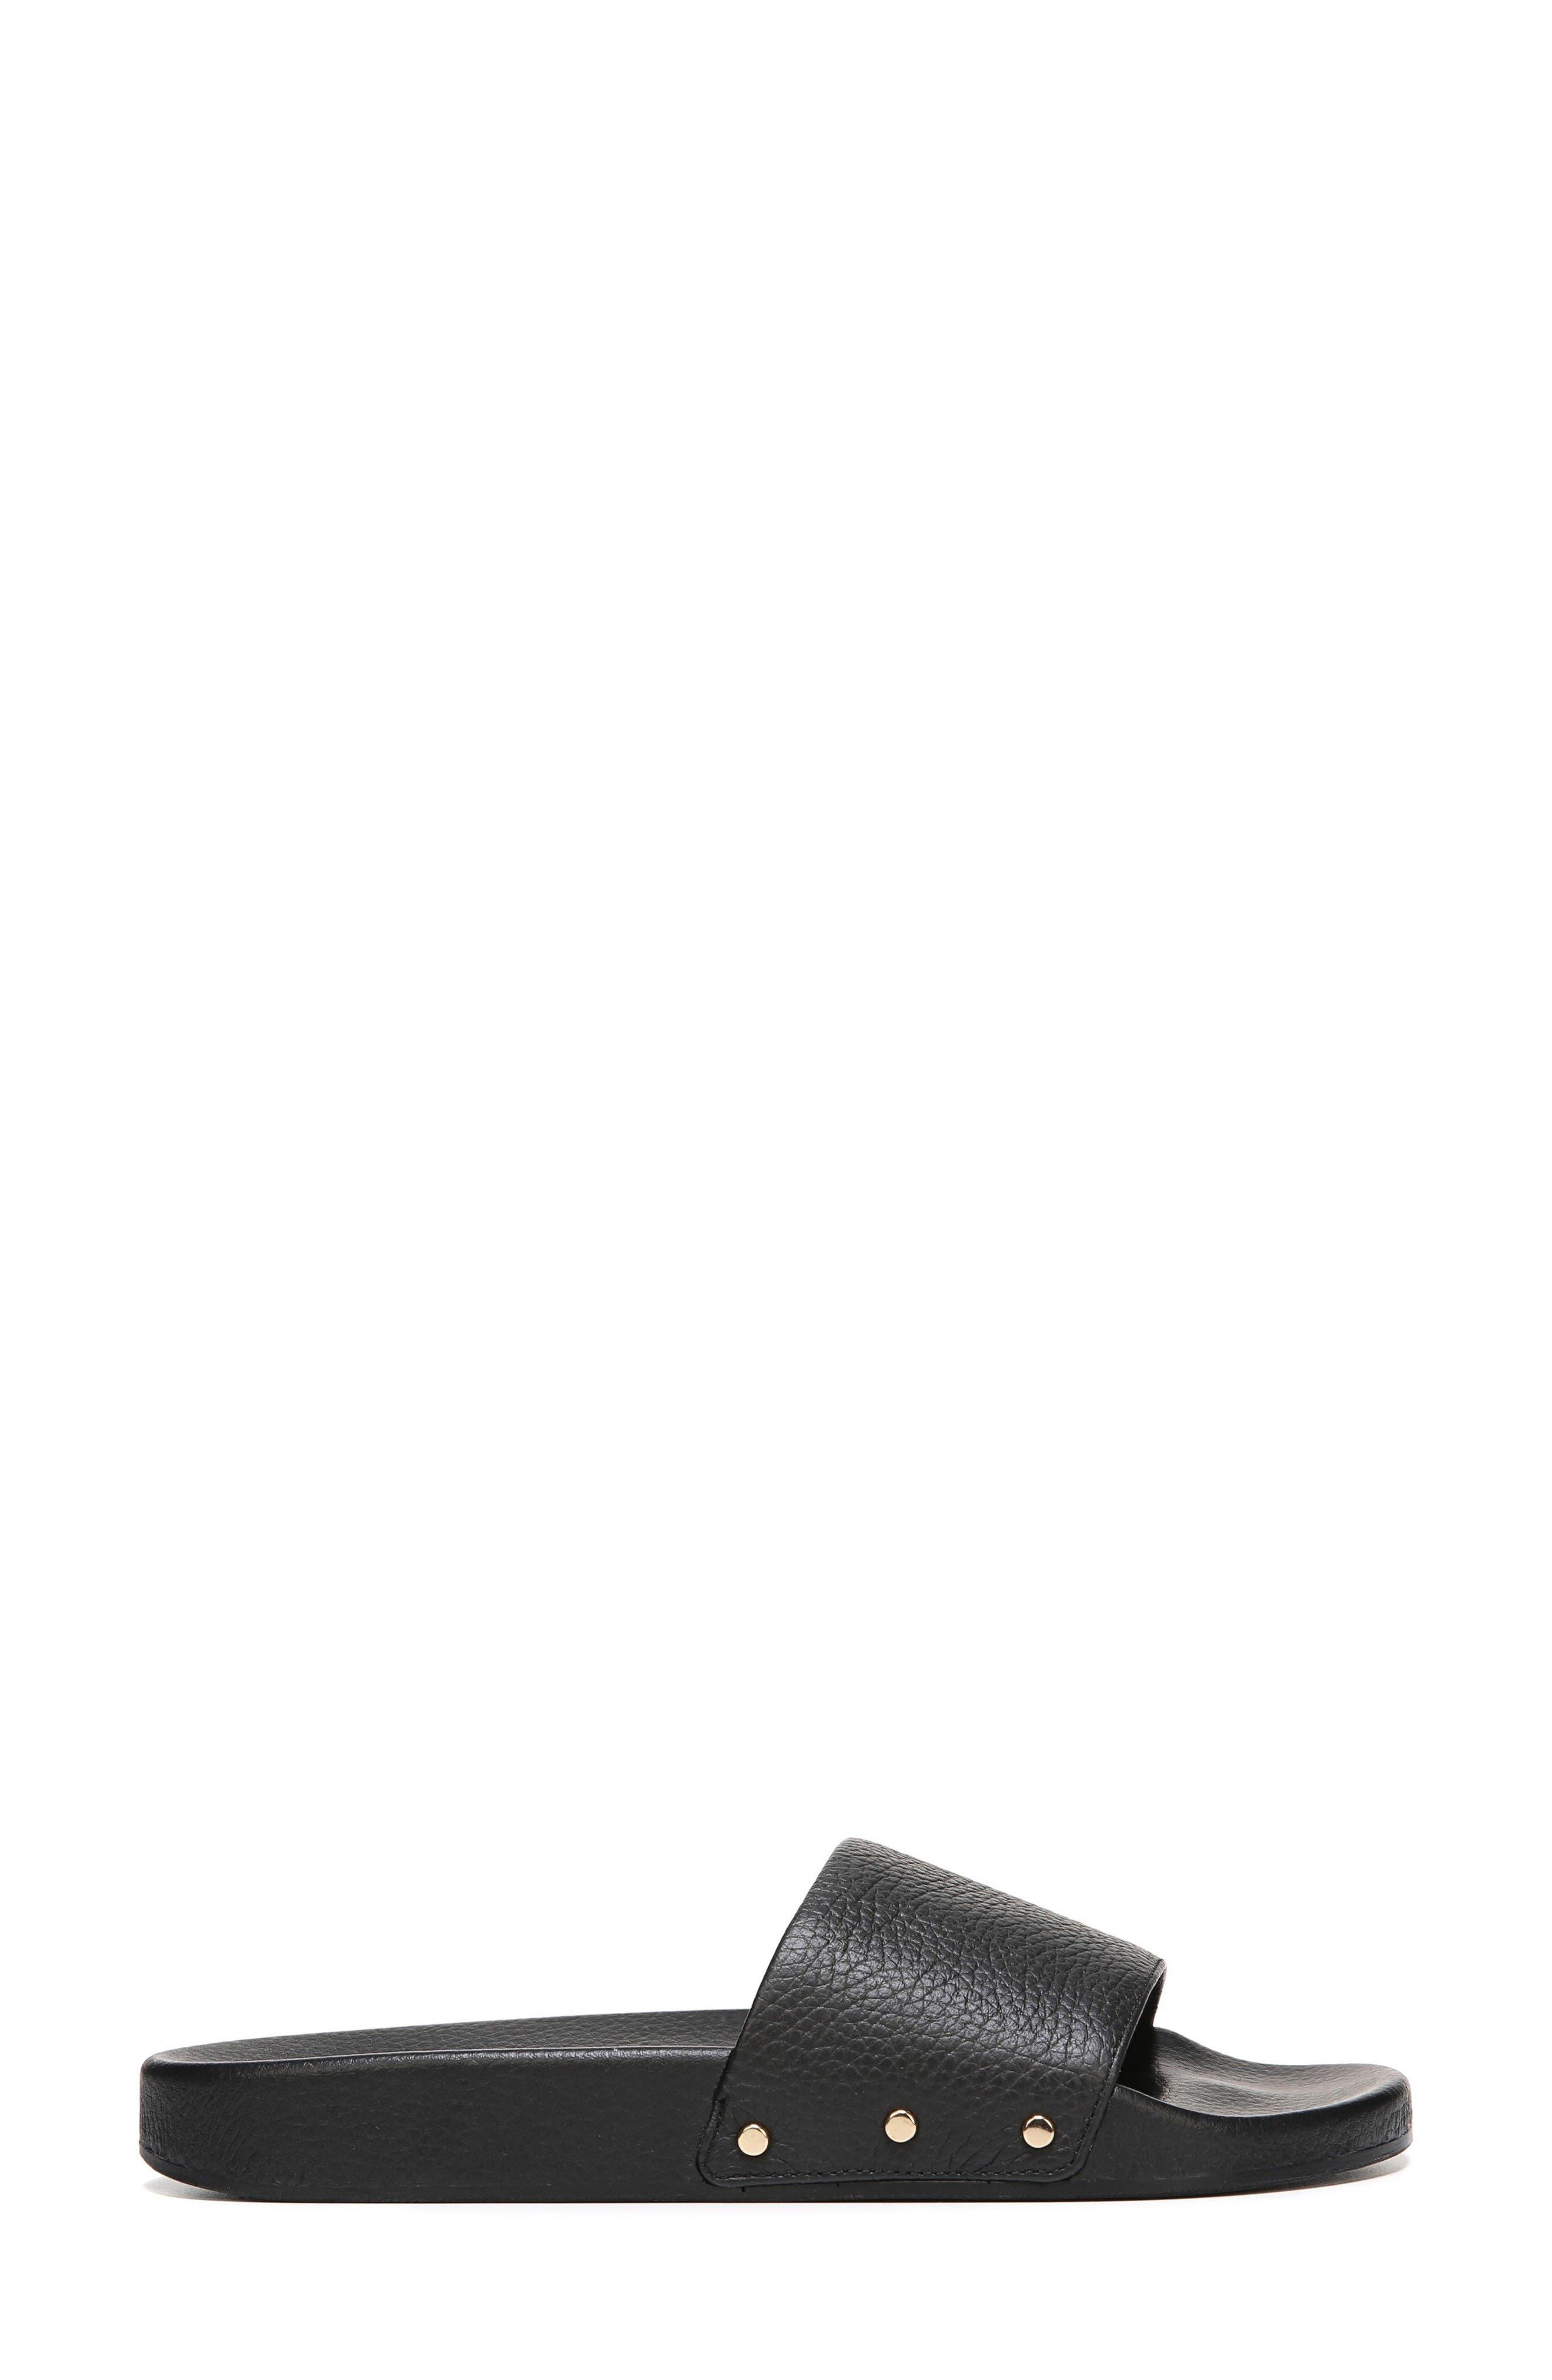 Pisces Slide Sandal,                             Alternate thumbnail 3, color,                             Black Leather